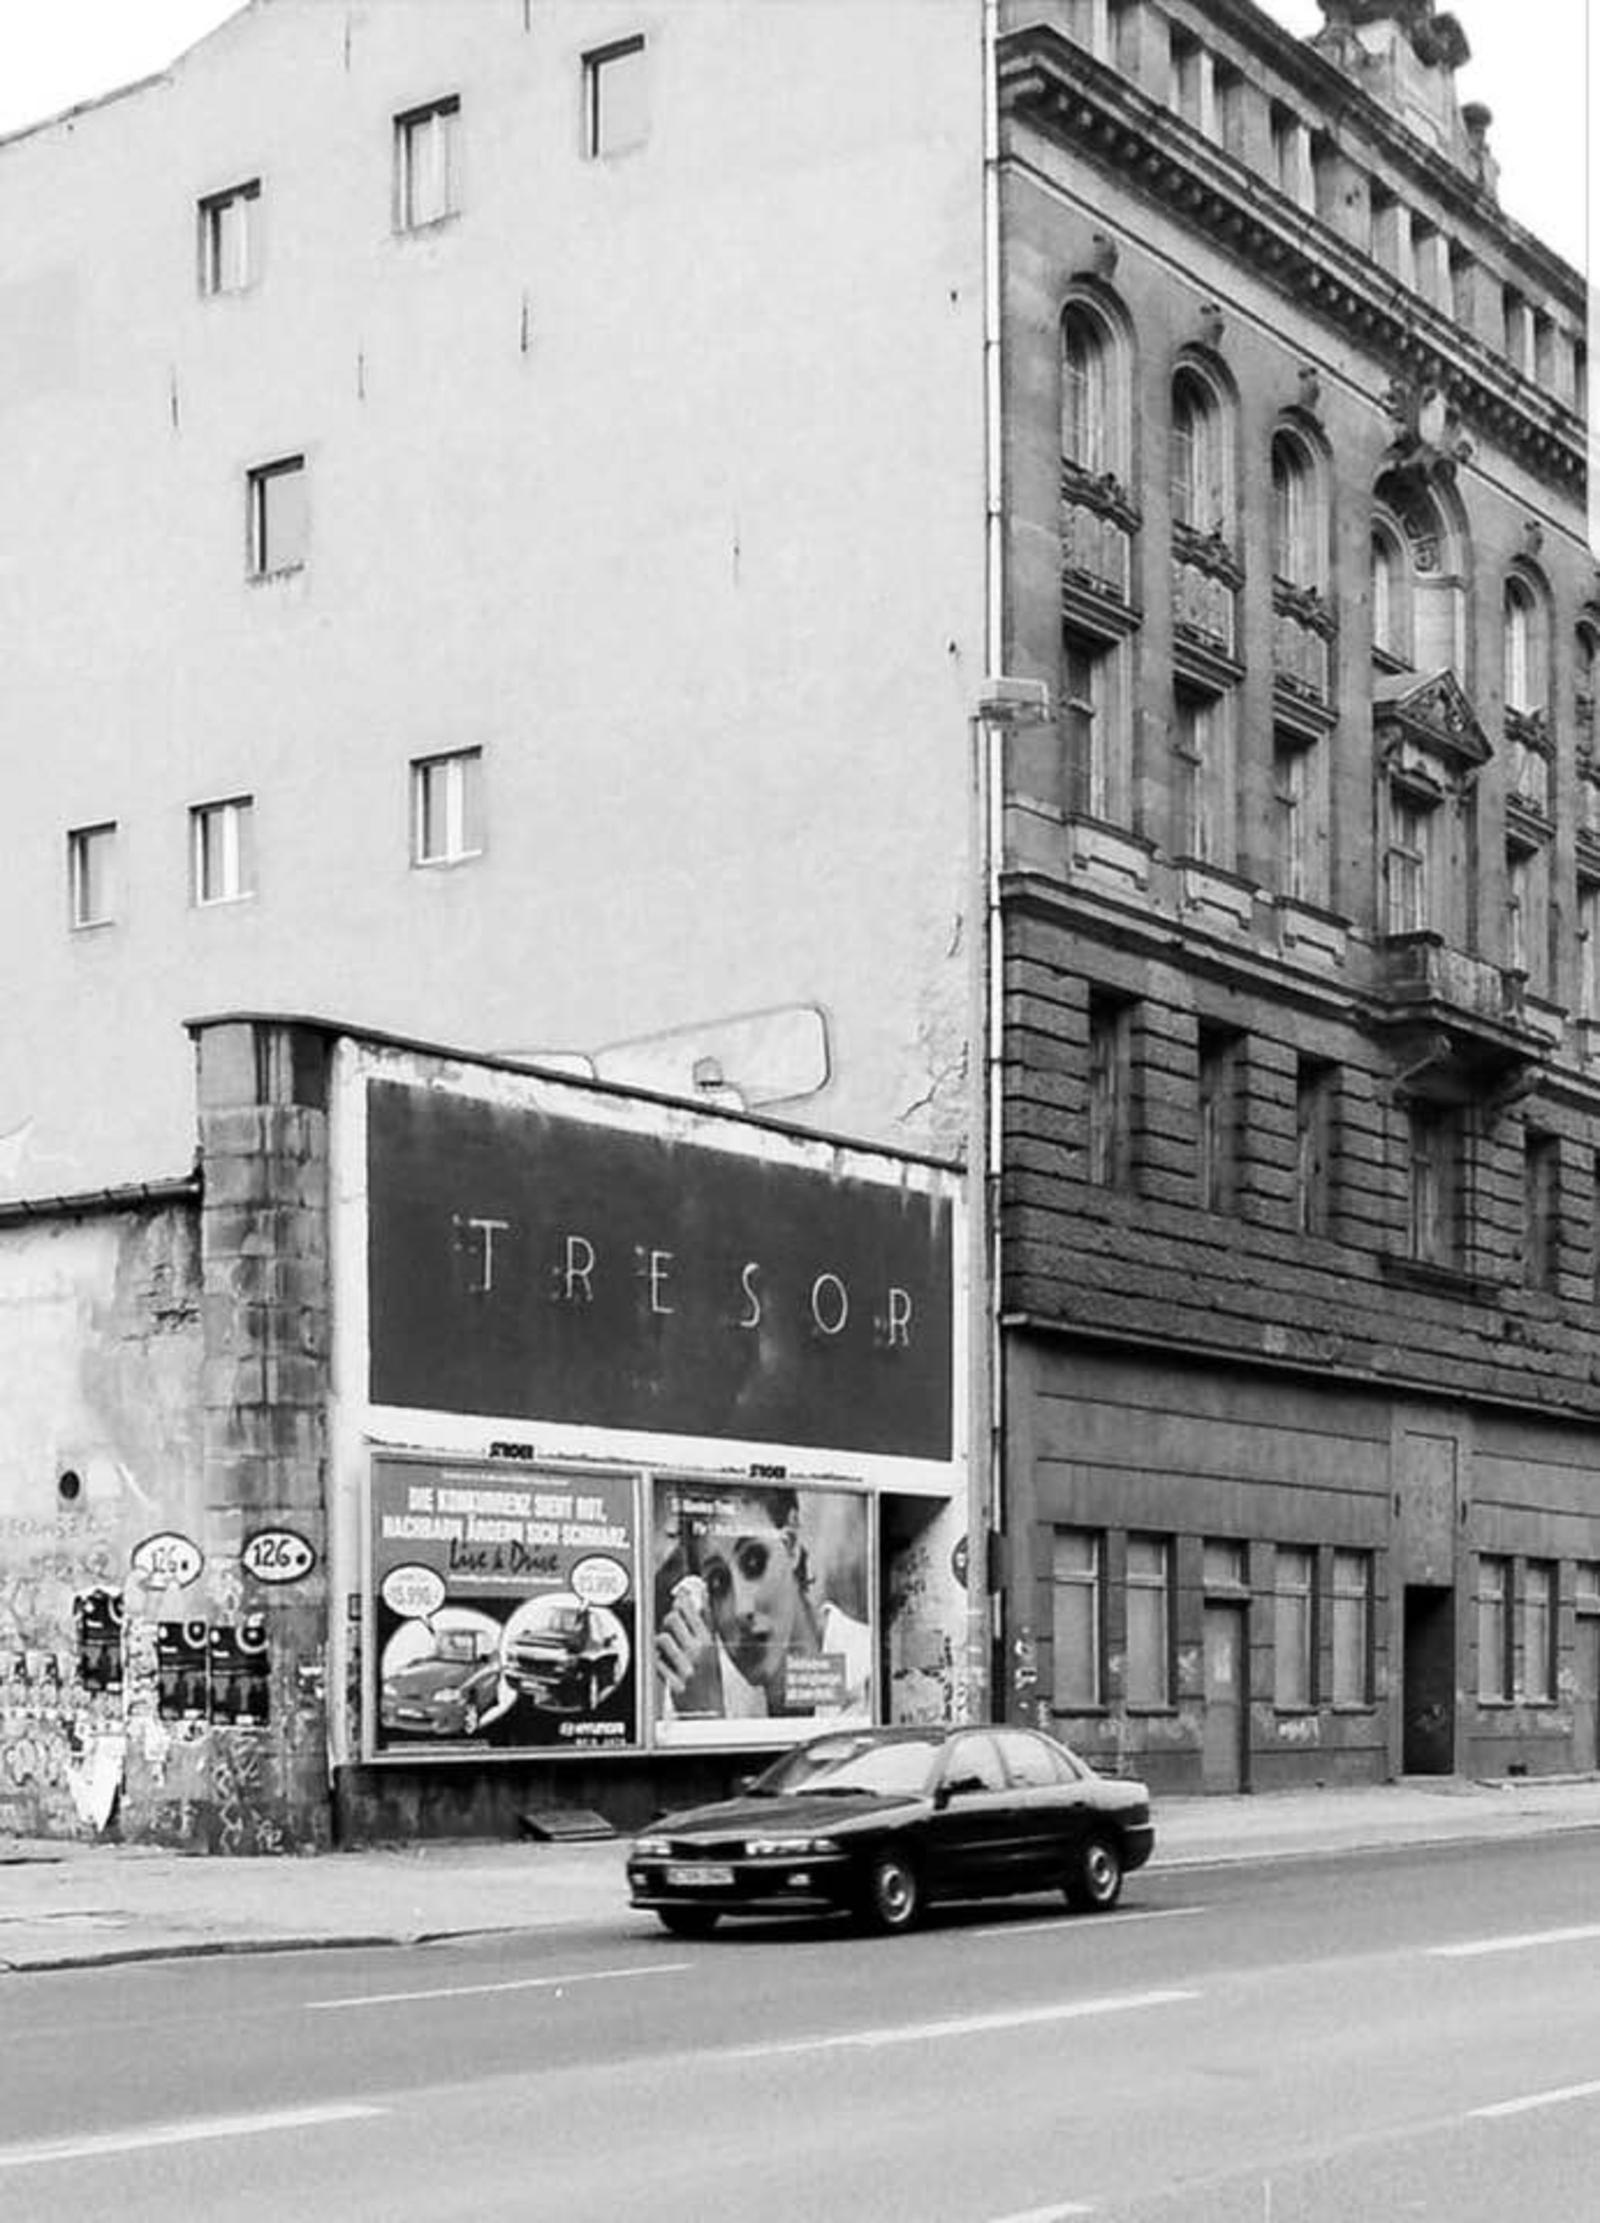 Tresor Leipziger Straße